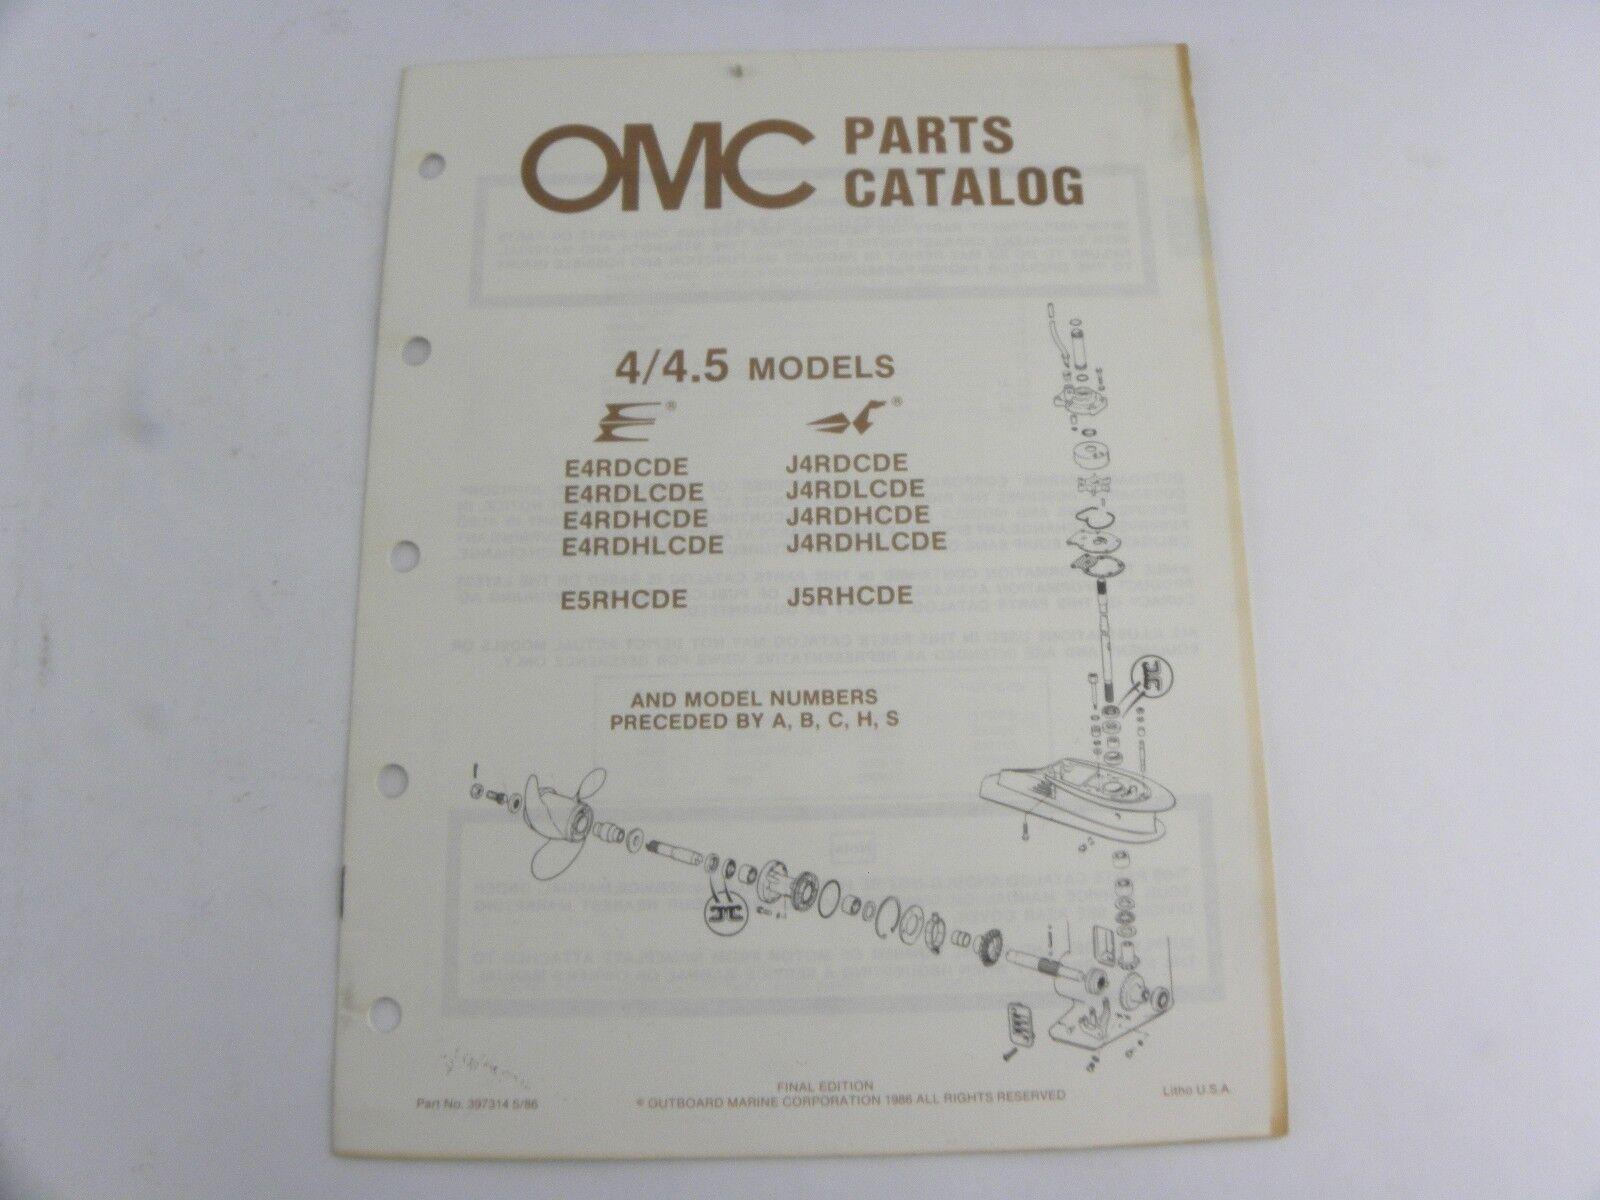 Evinrude Johnson 4/4.5 Models Outboard Motor Parts Catalog Manual 1986 OMC